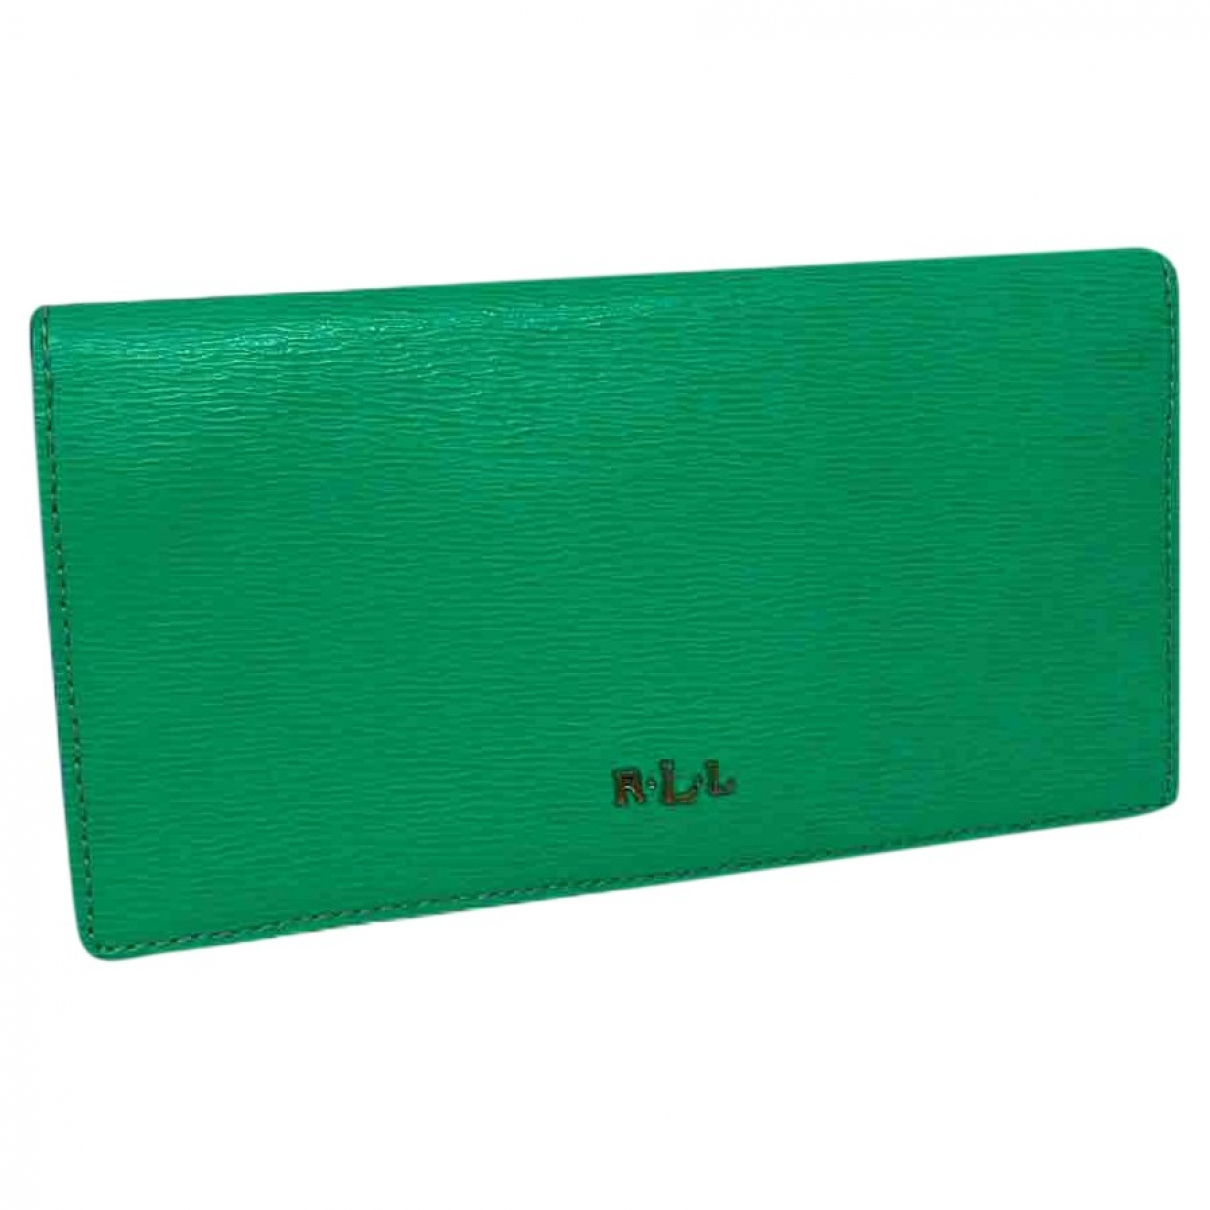 Ralph Lauren - Portefeuille   pour femme en cuir - vert